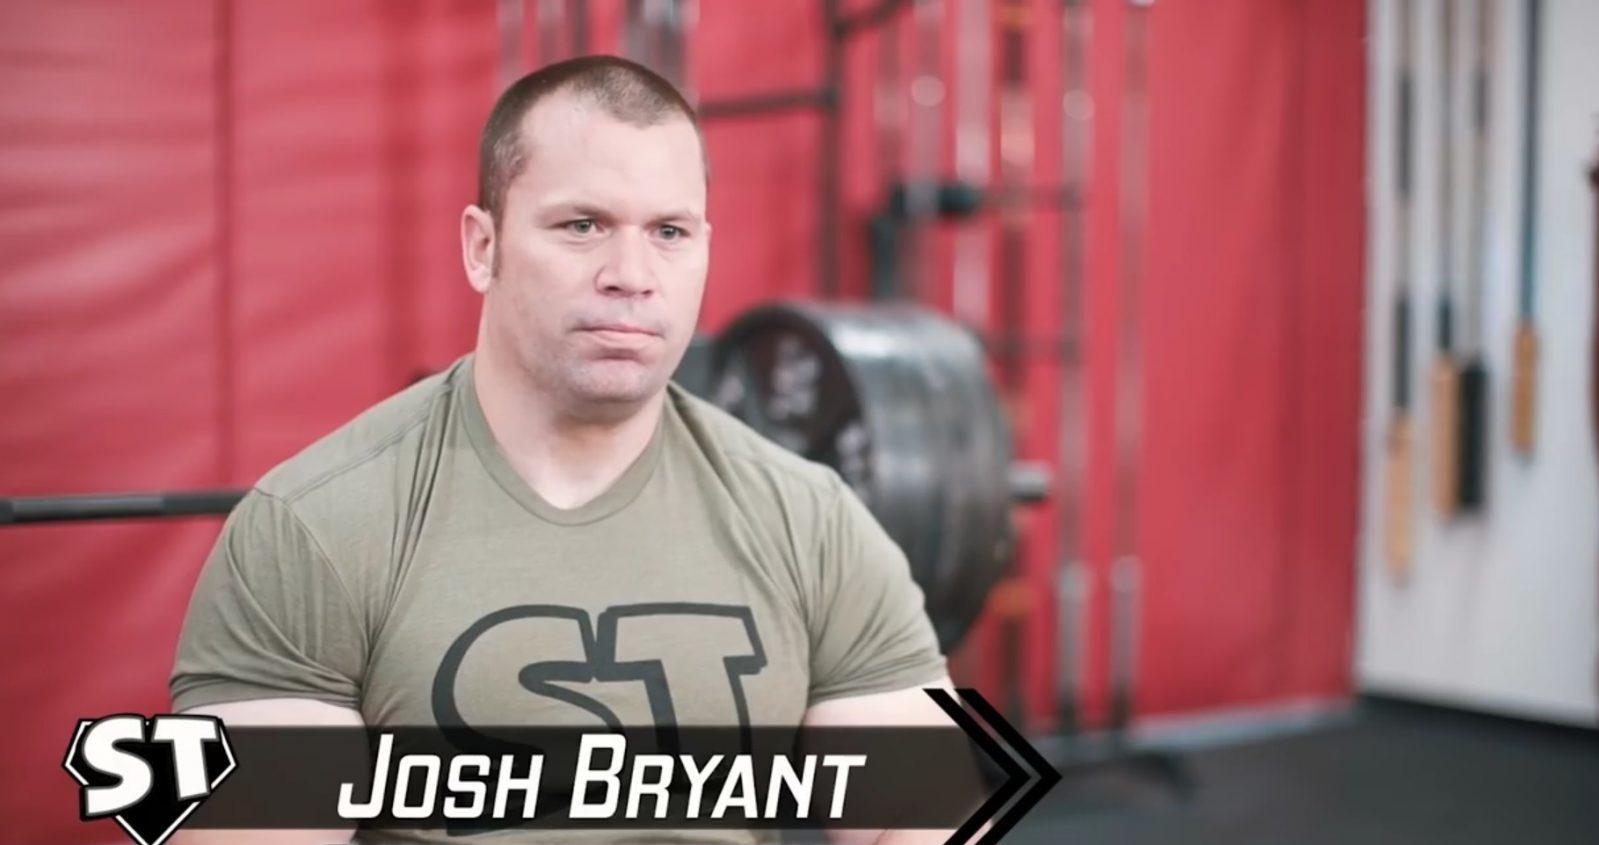 Josh Bryant